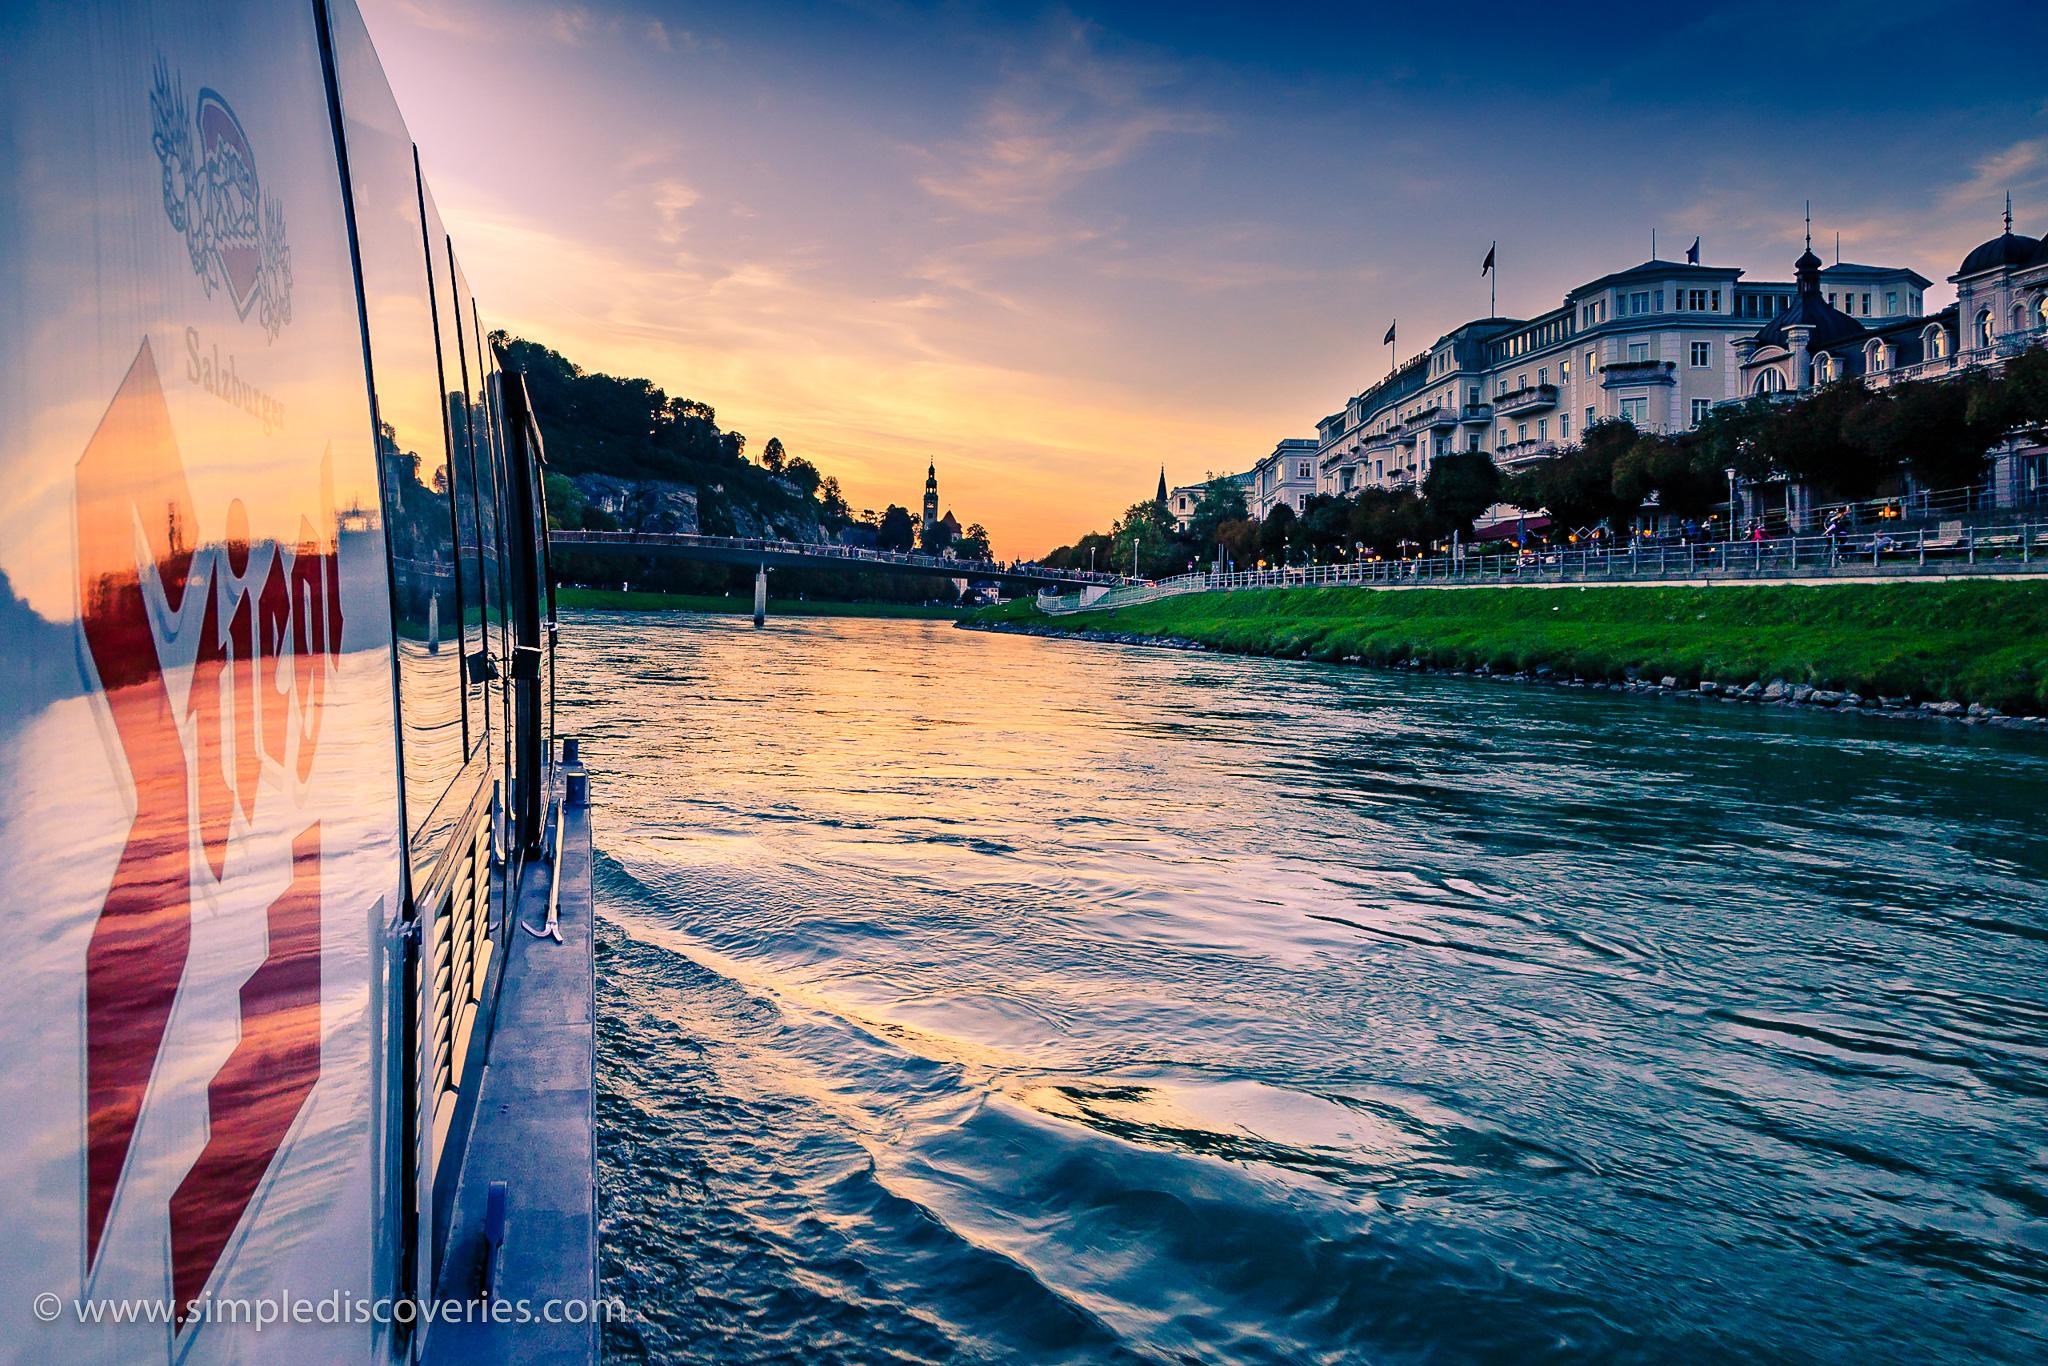 salzach_river_austria